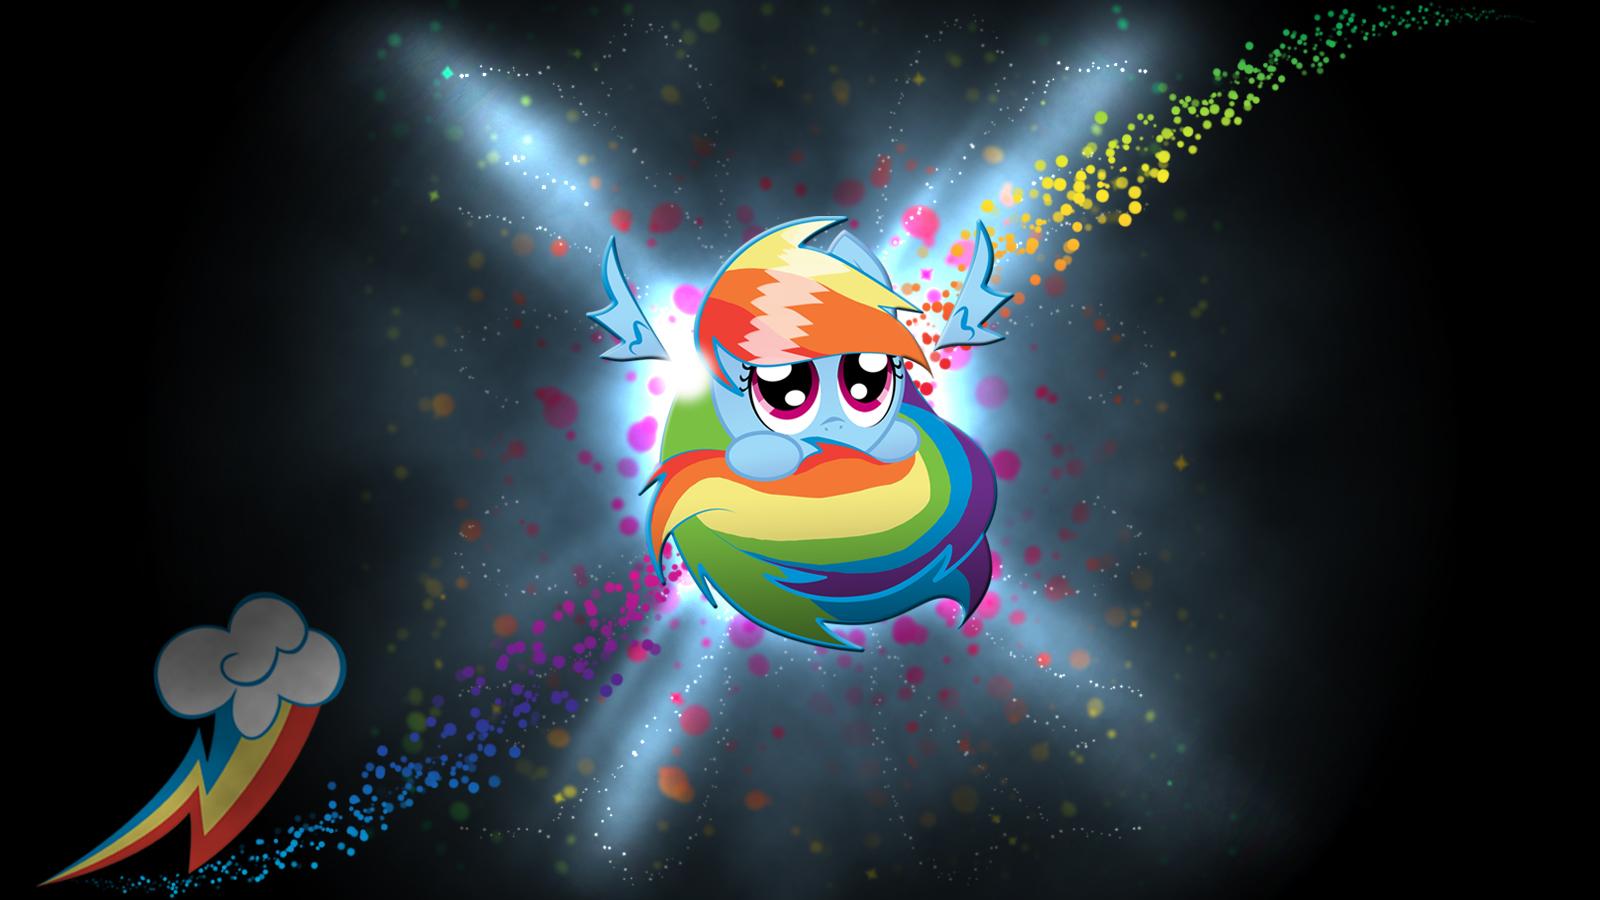 Rainbow Dash Wallpapers HD PixelsTalk Rainbow Dash Sphere Background by Kuroiraishu on DeviantArt 1600x900